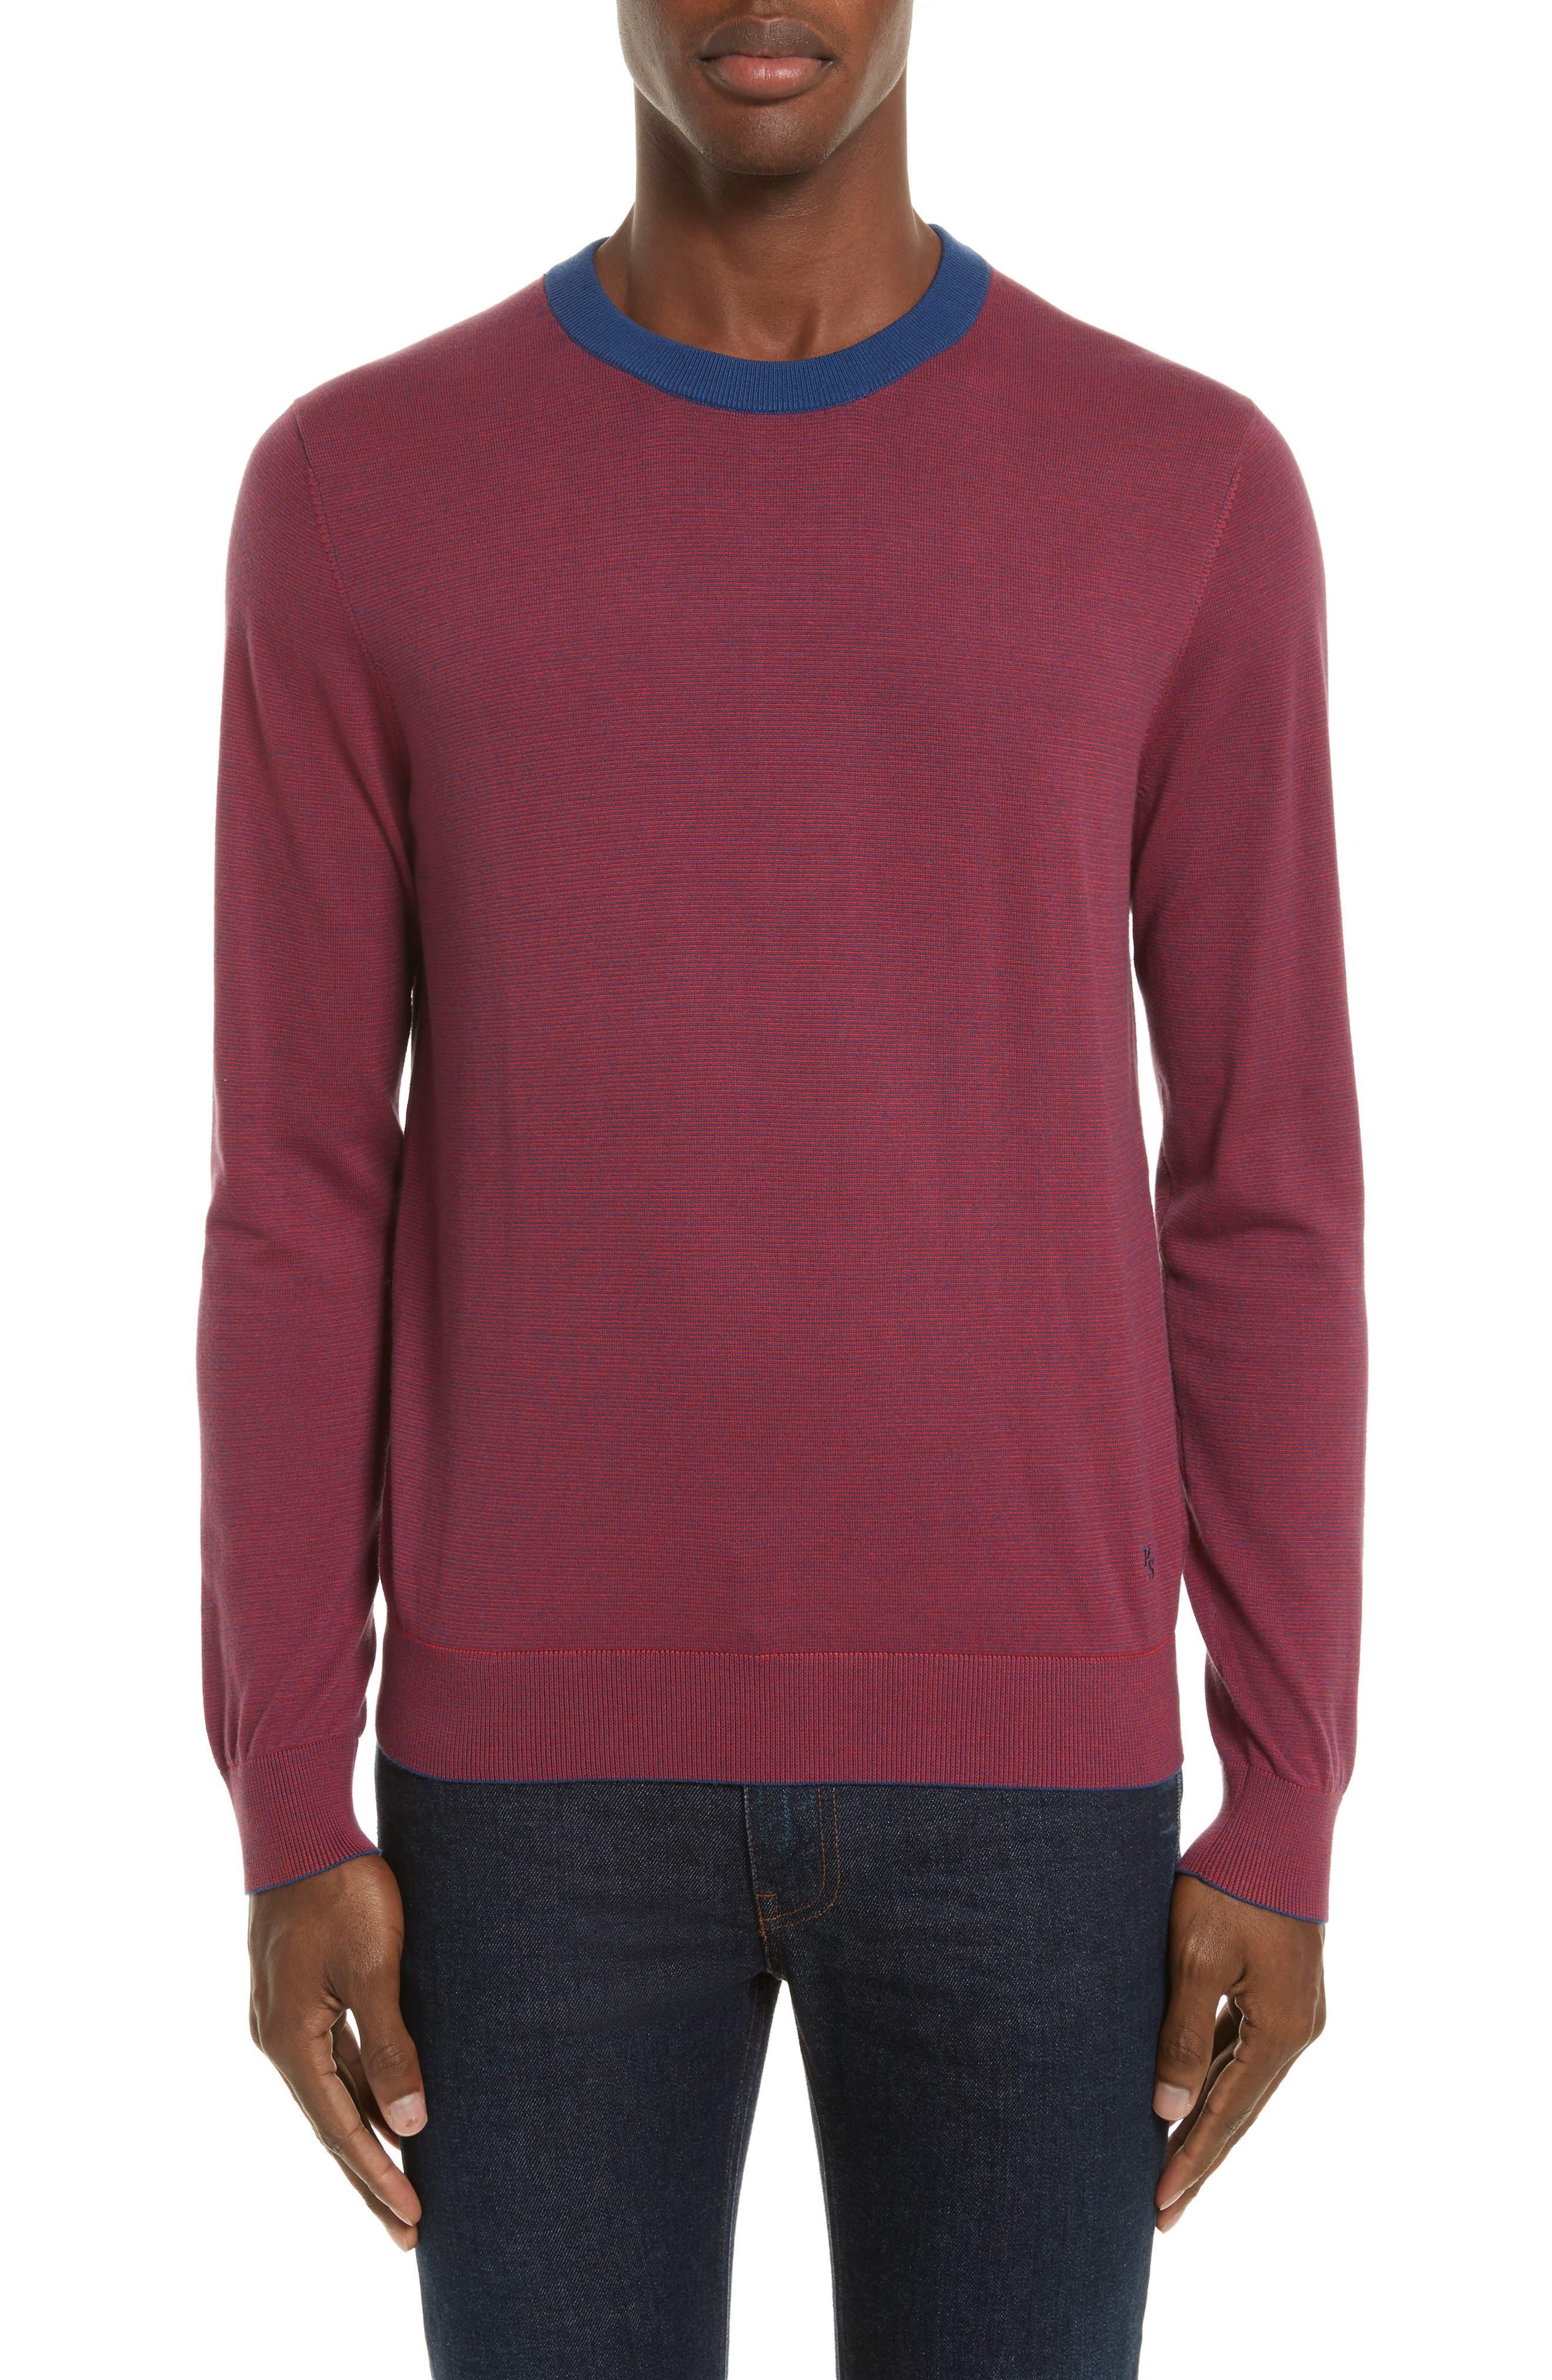 Ministripe Crewneck Sweater,                             Main thumbnail 1, color,                             415